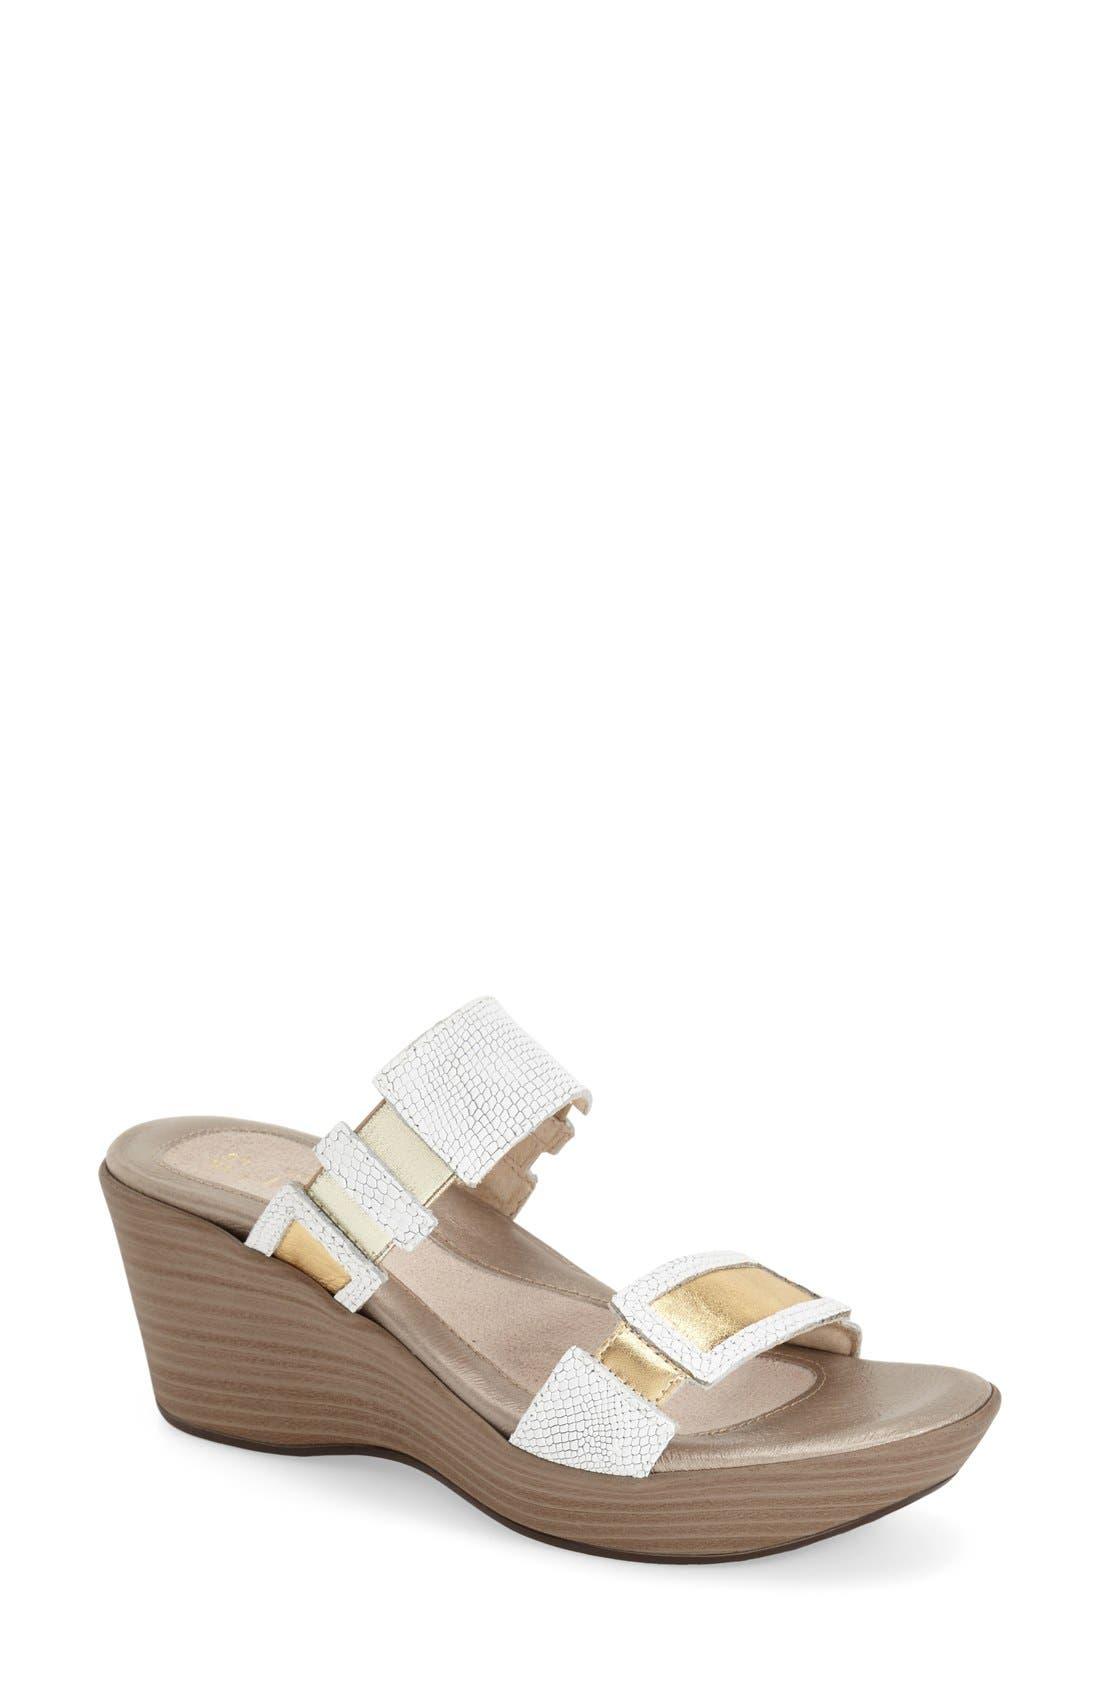 'Treasure' Sandal,                         Main,                         color, WHITE GOLD SNAKE LEATHER